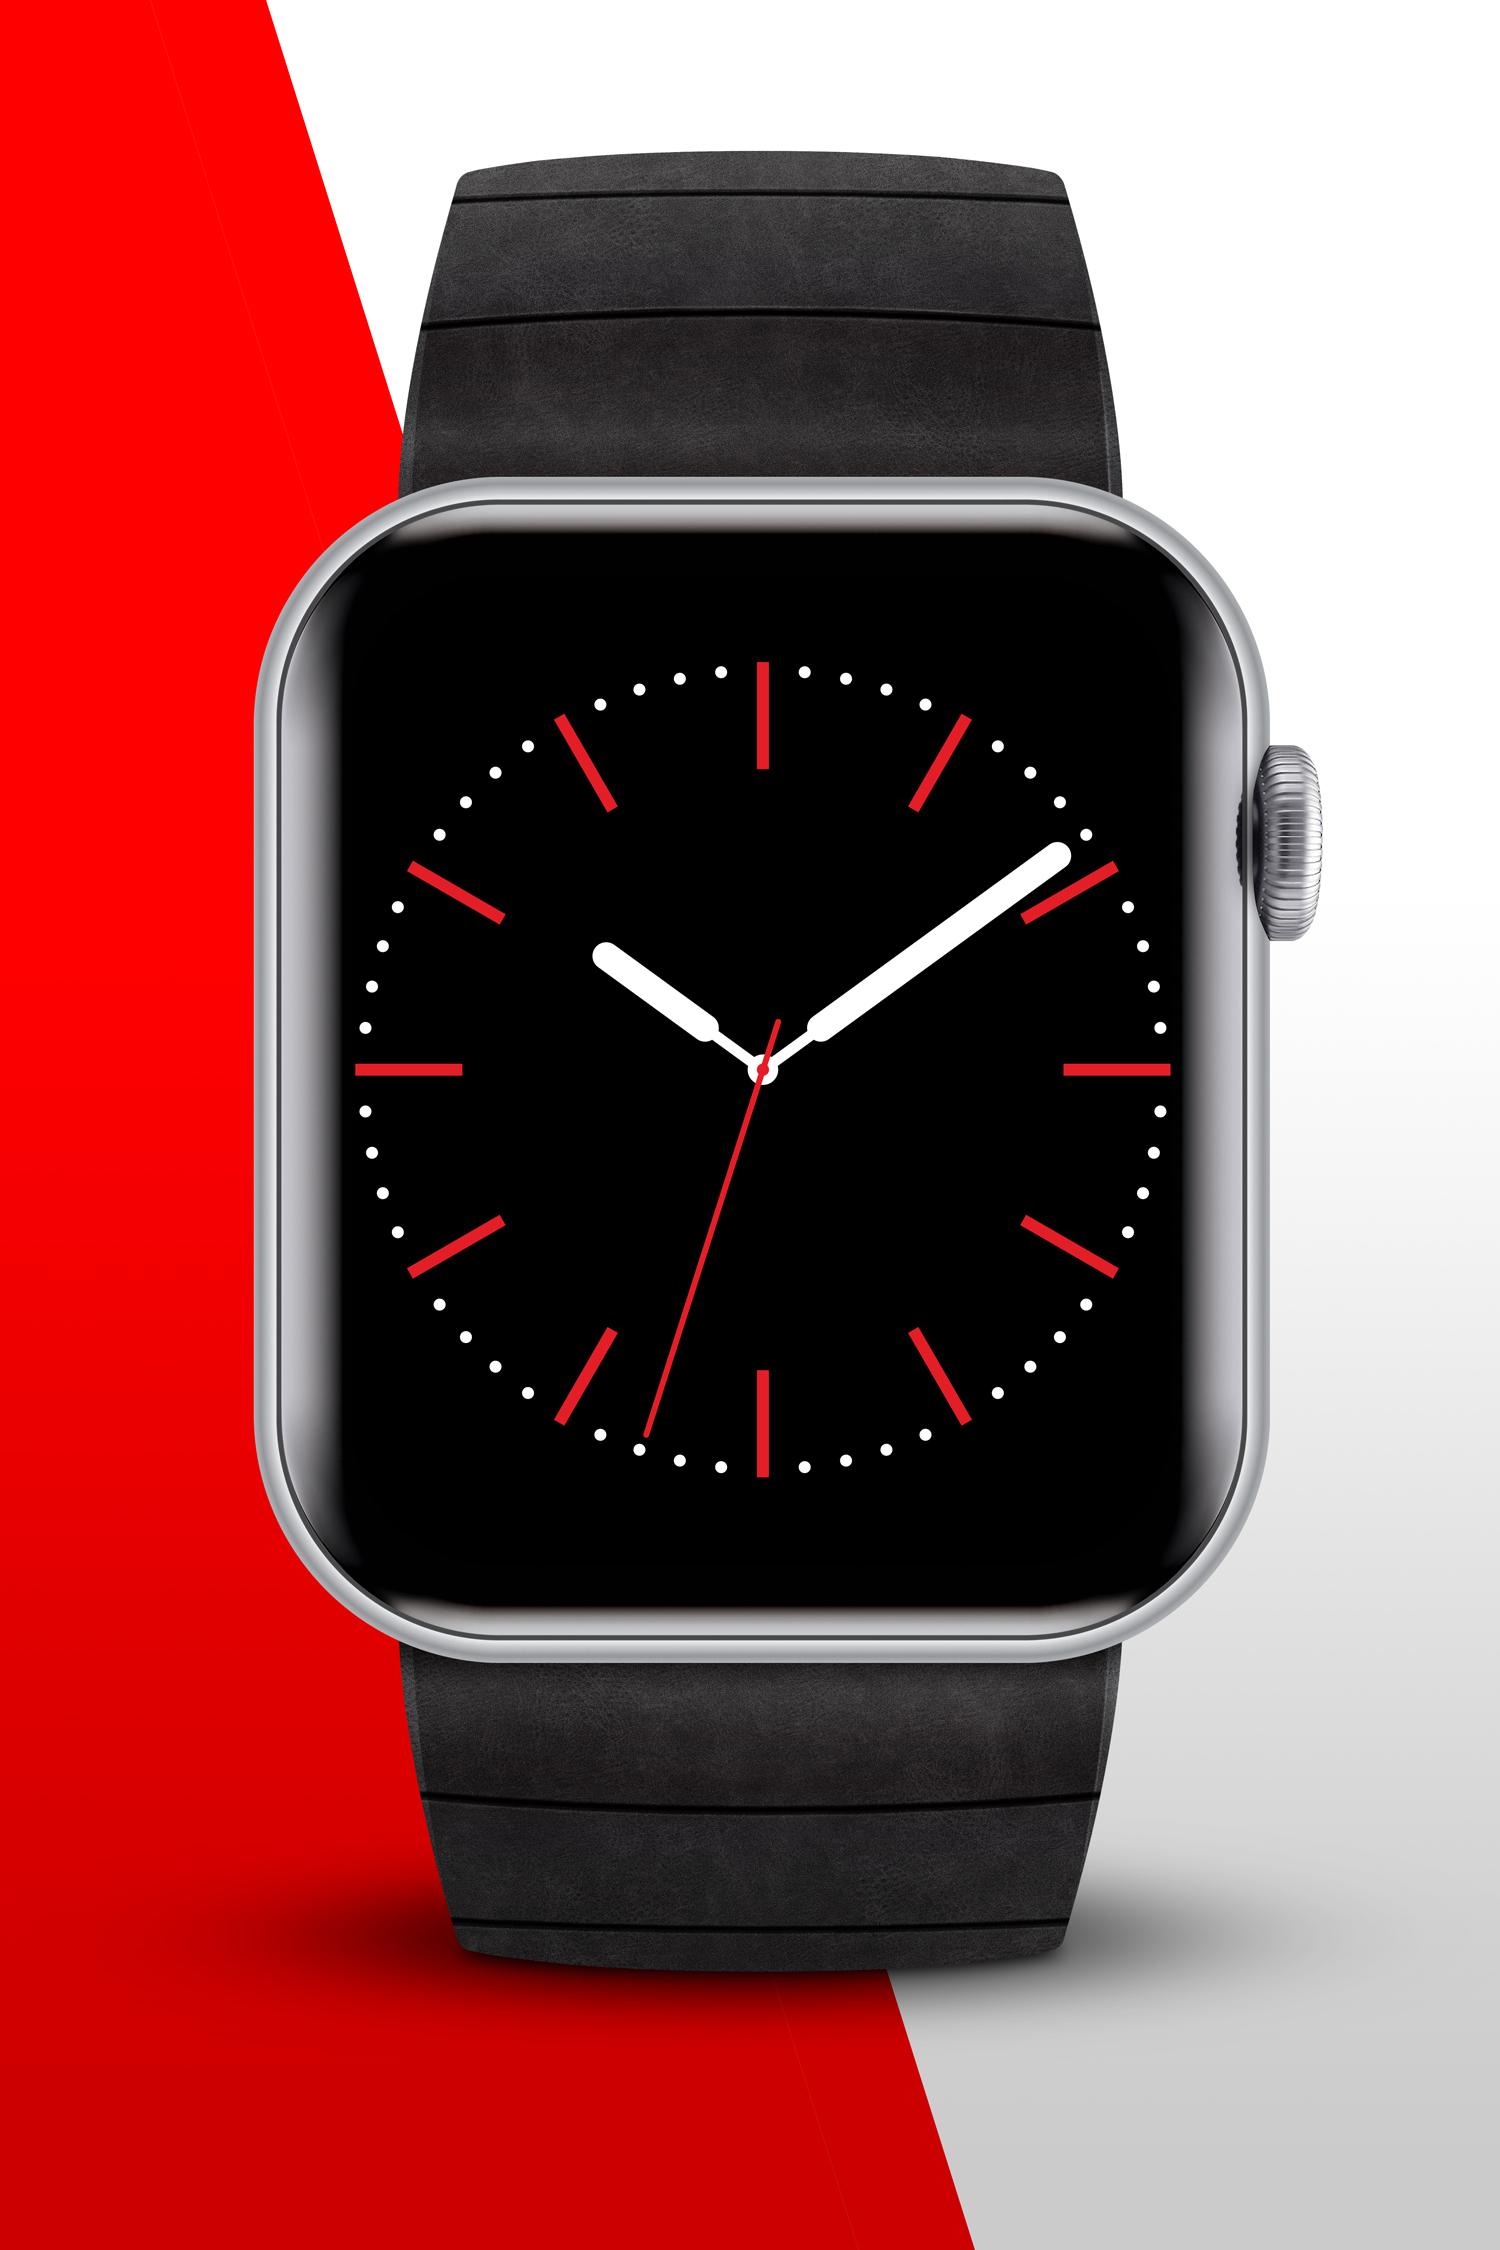 موکاپ ساعت هوشمند(اسمارت واچ)